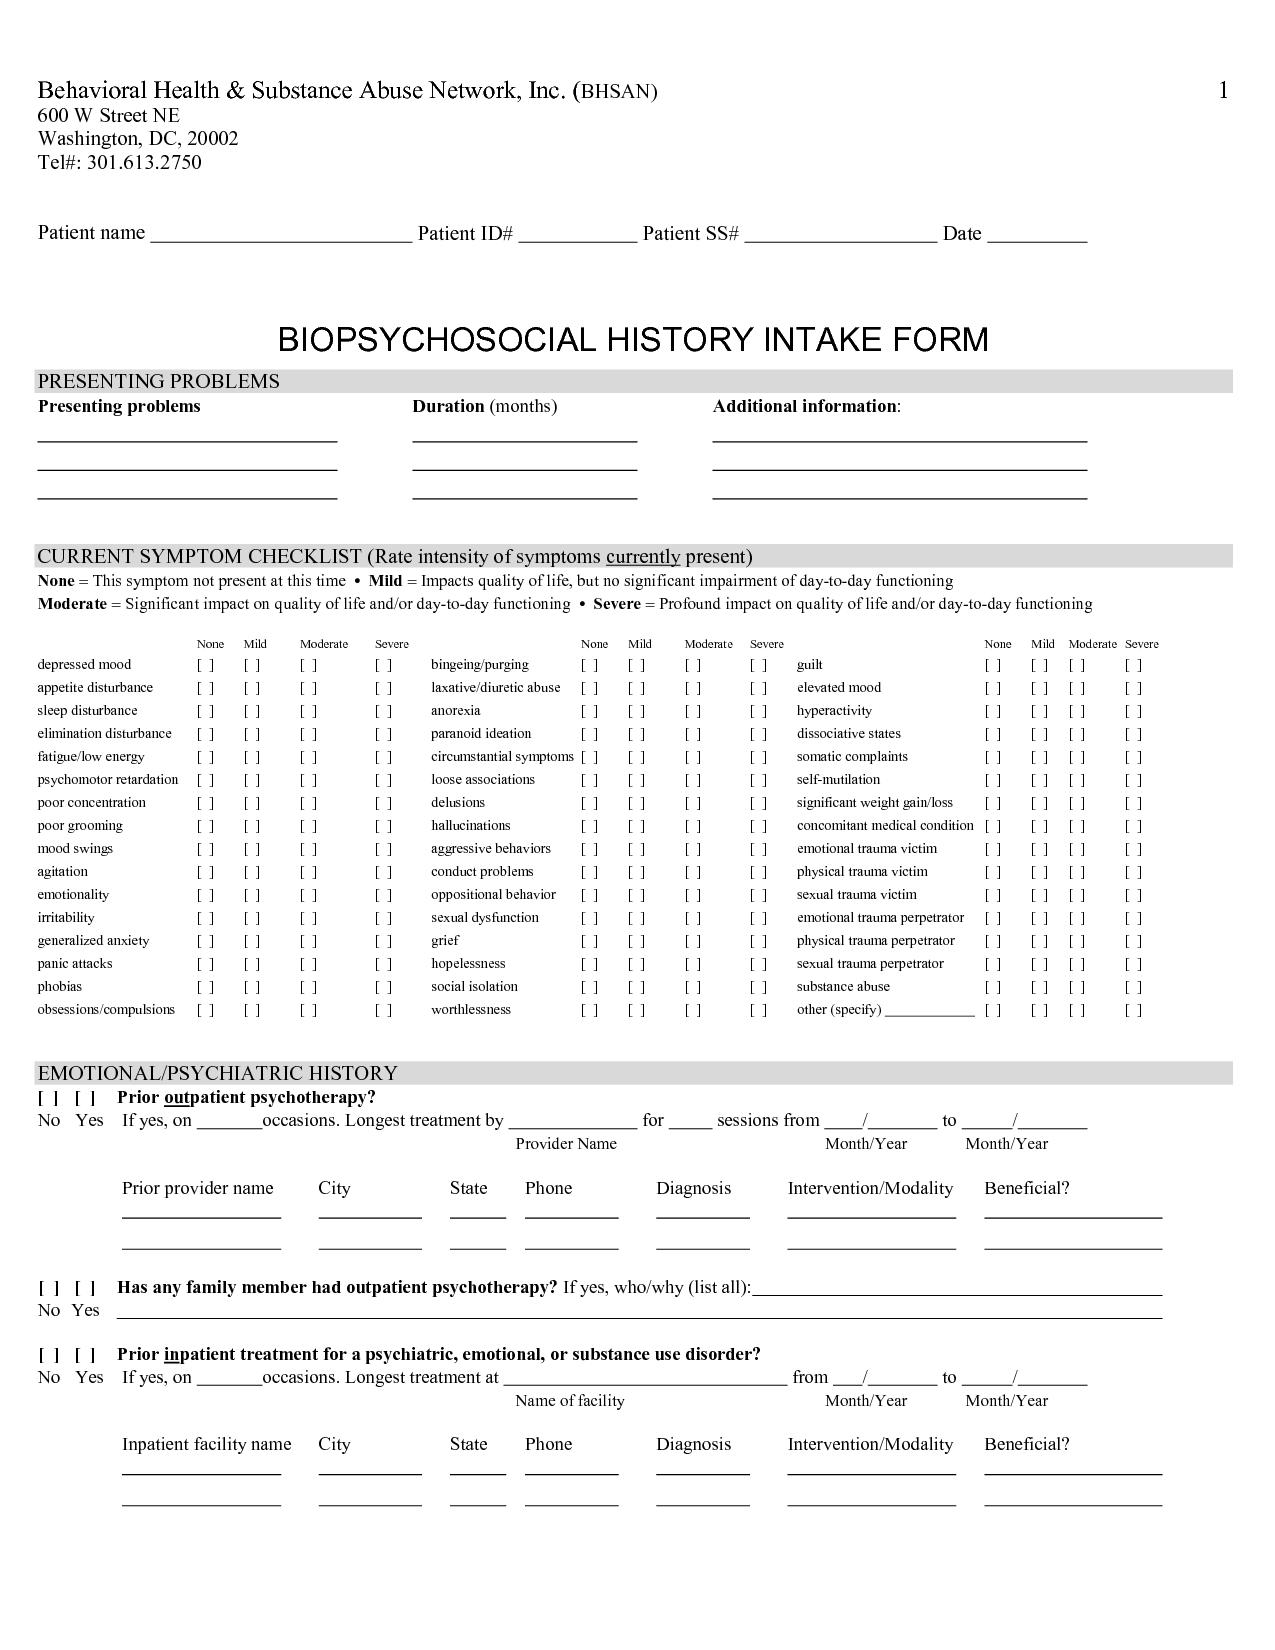 Social History Intake Form  Art Therapy    History